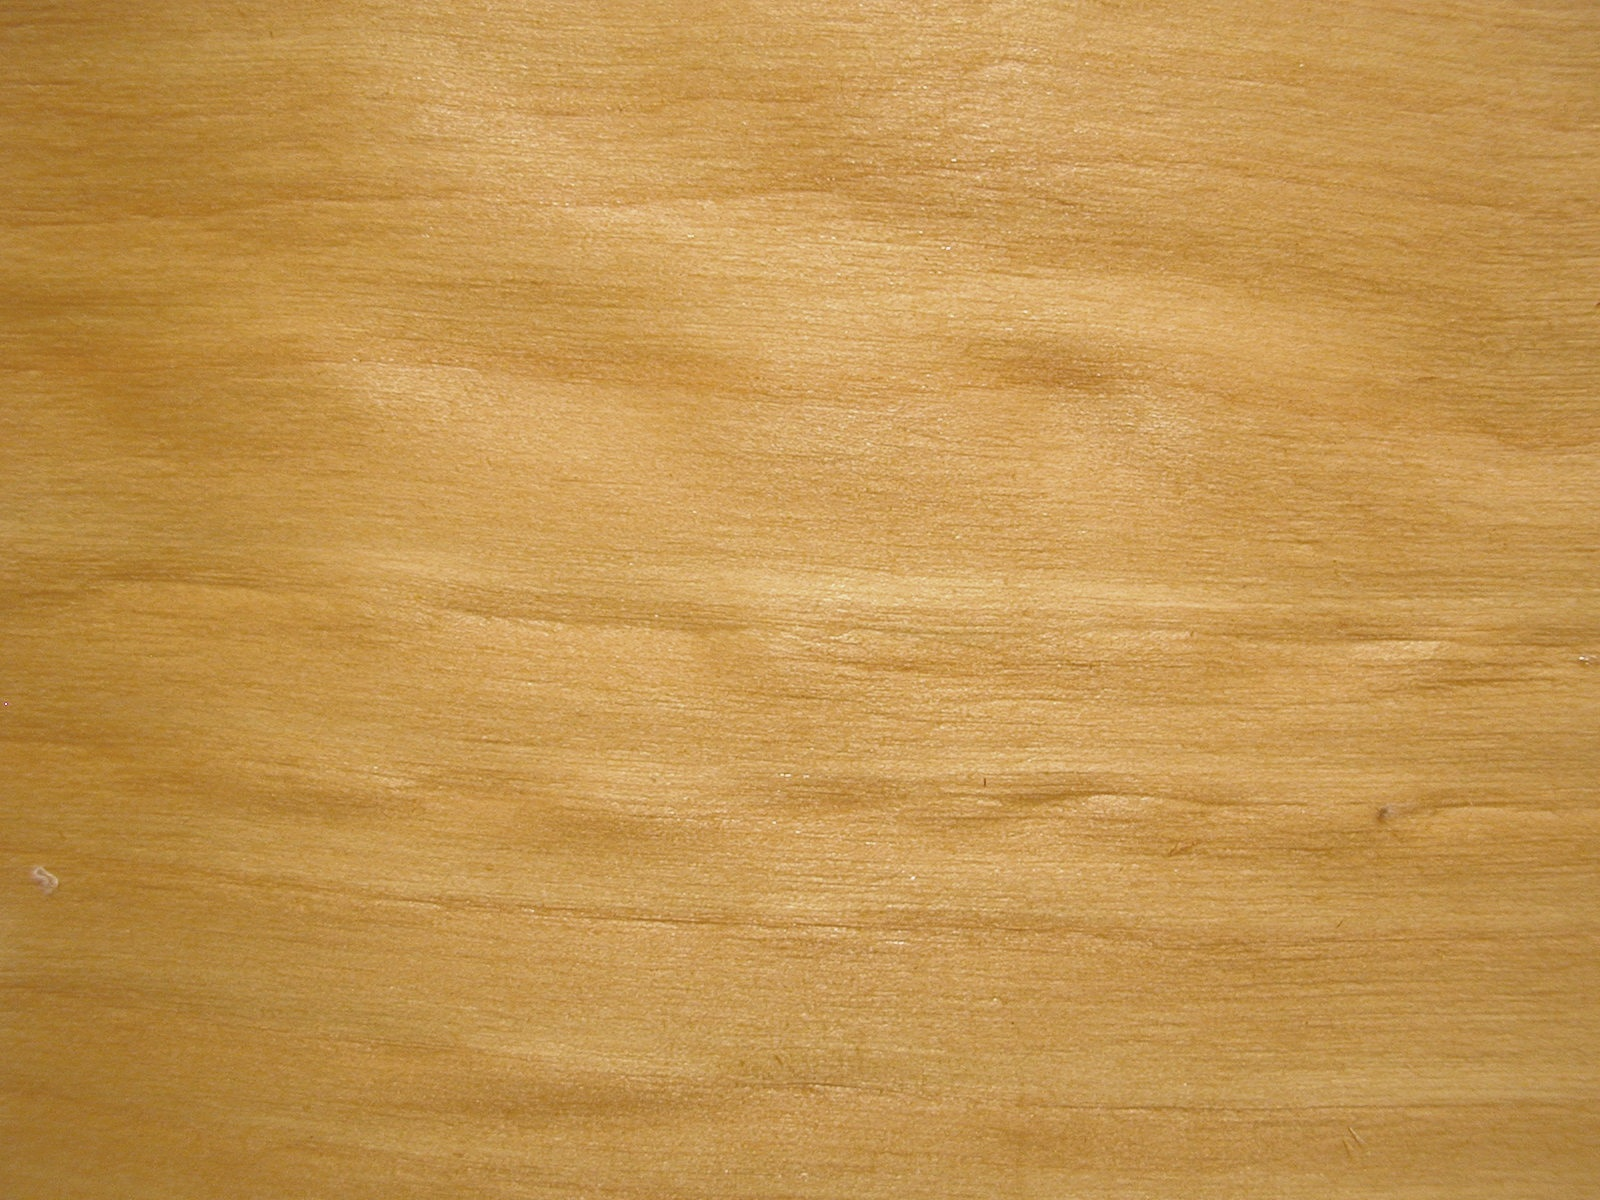 Holz Birke file birke holz jpg wikimedia commons